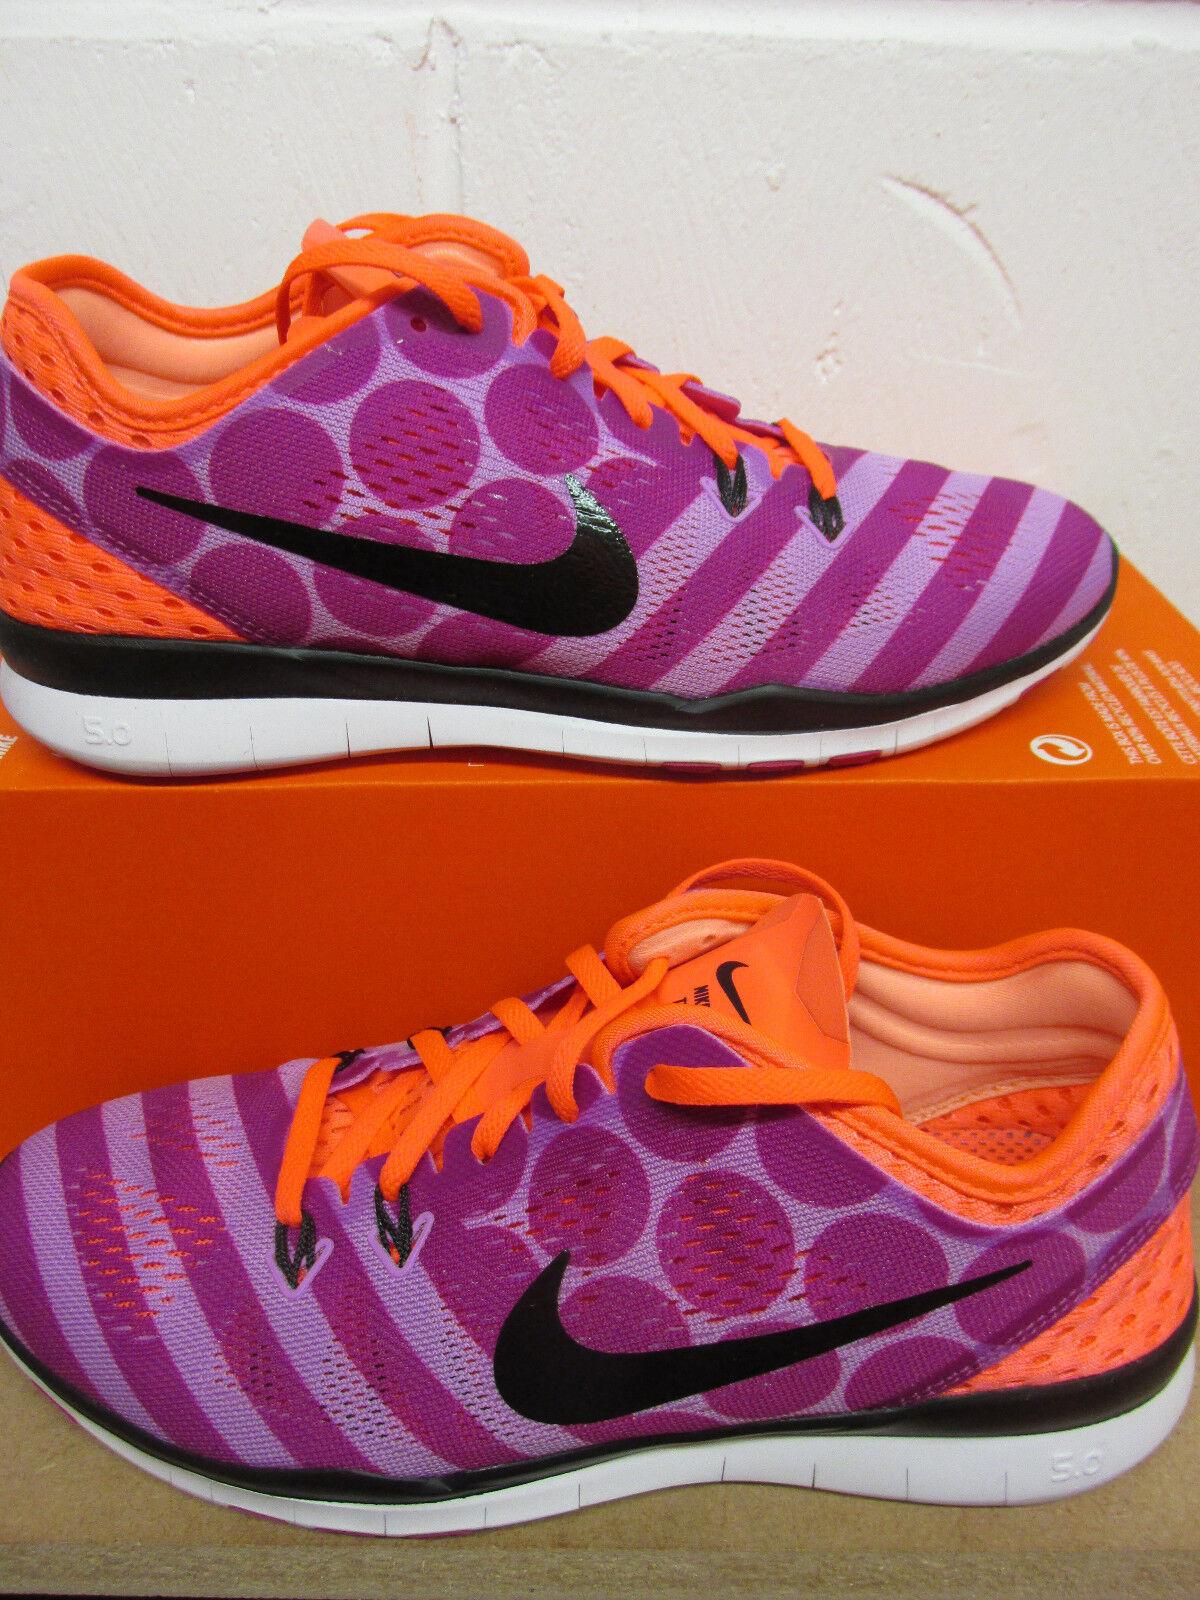 Nike Kostenlose 5.0 Tr Turnschuhe Passform 5 Prt Herren Turnschuhe Tr 704695 500 Sneakers 6acc8b